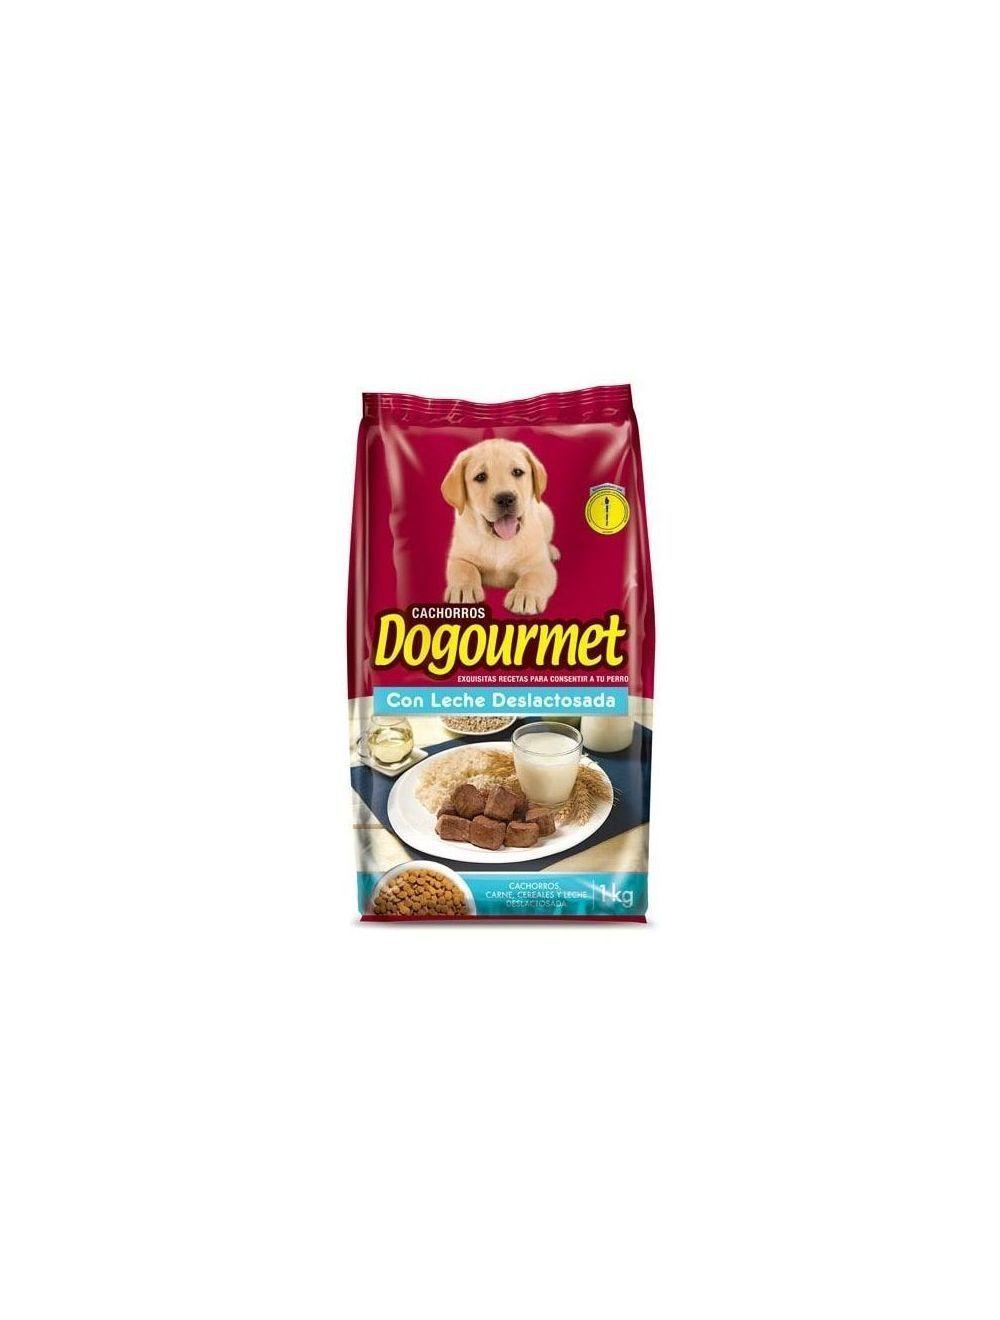 Comida Perro Dogourmet Leche Deslactosada -Ciudaddemascotas.com